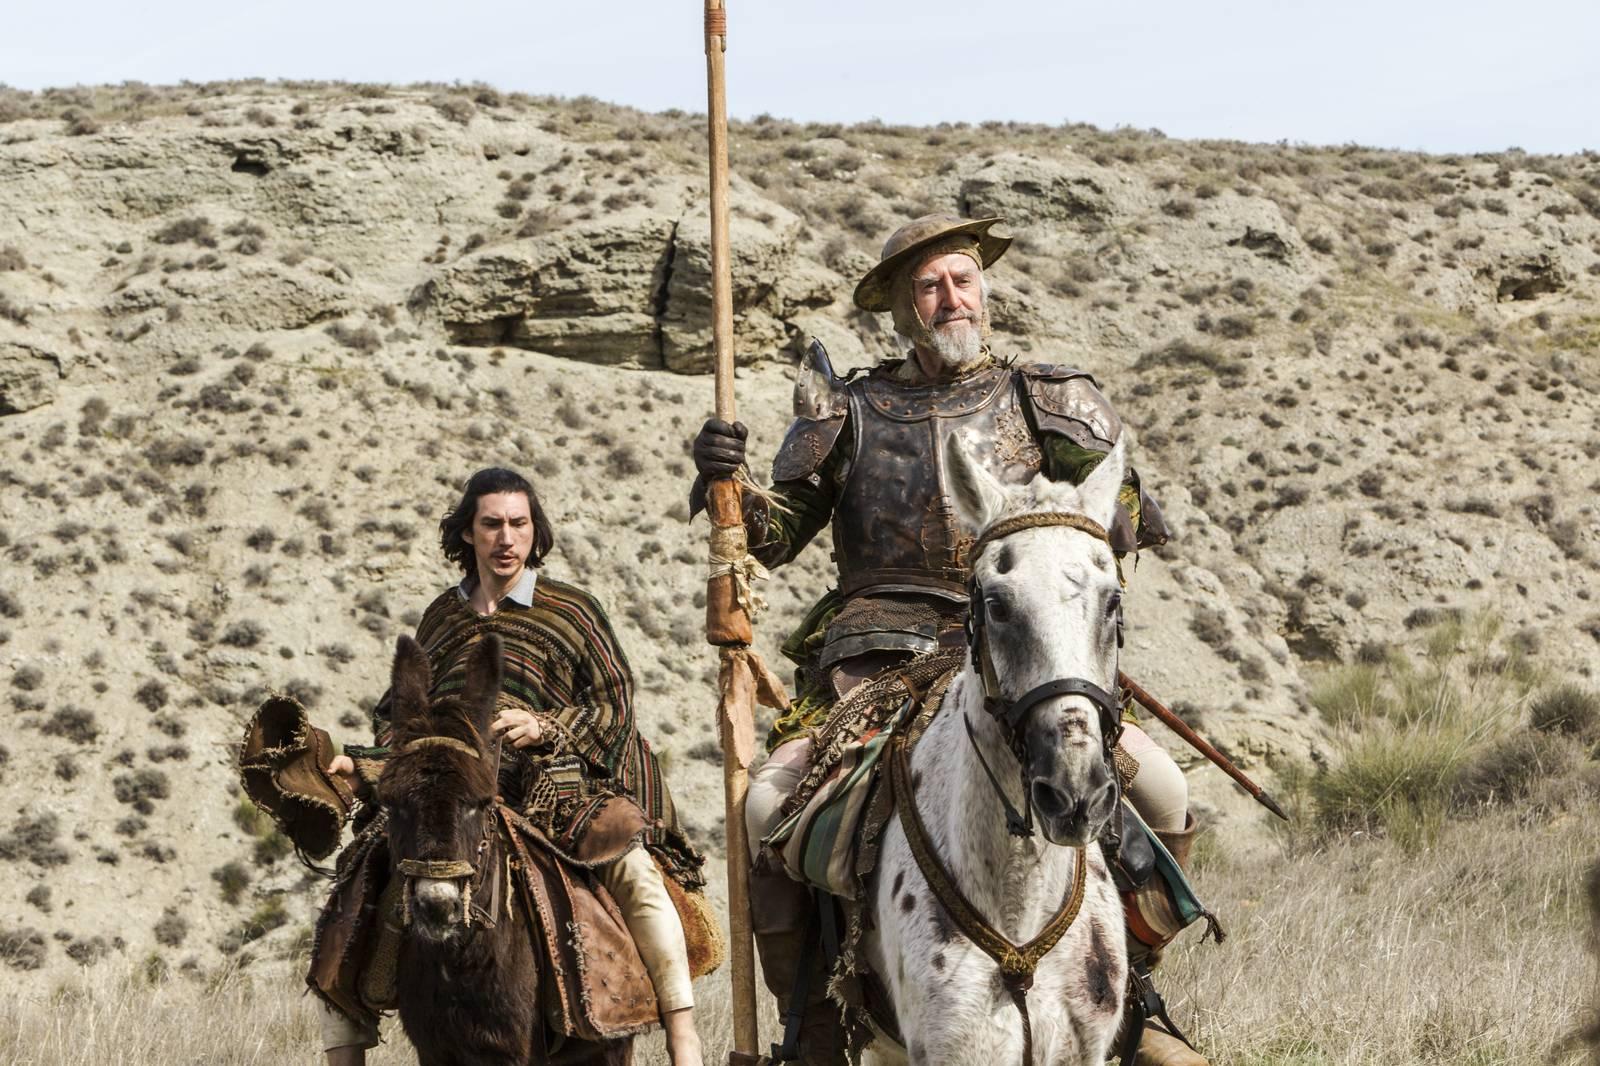 Film Muž, ktorý zabil Dona Quijota (2018)